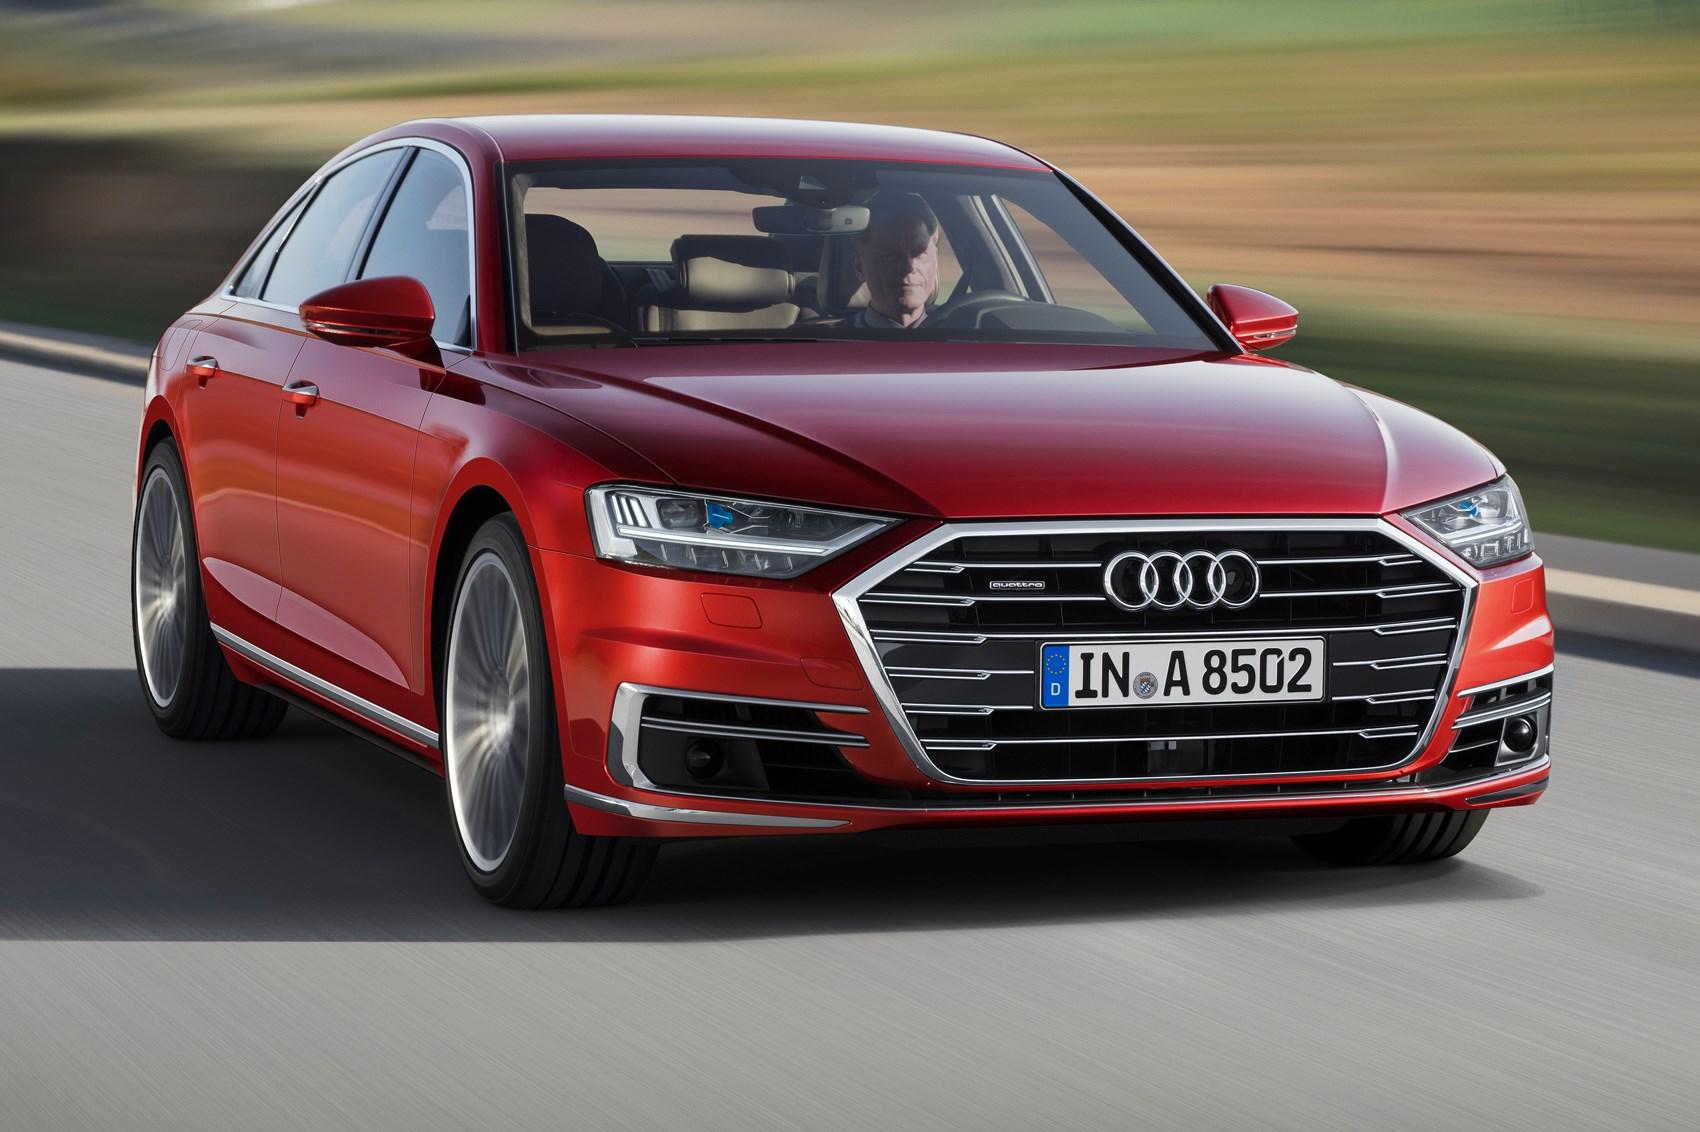 The New 2017 Audi A8 Bodyshell